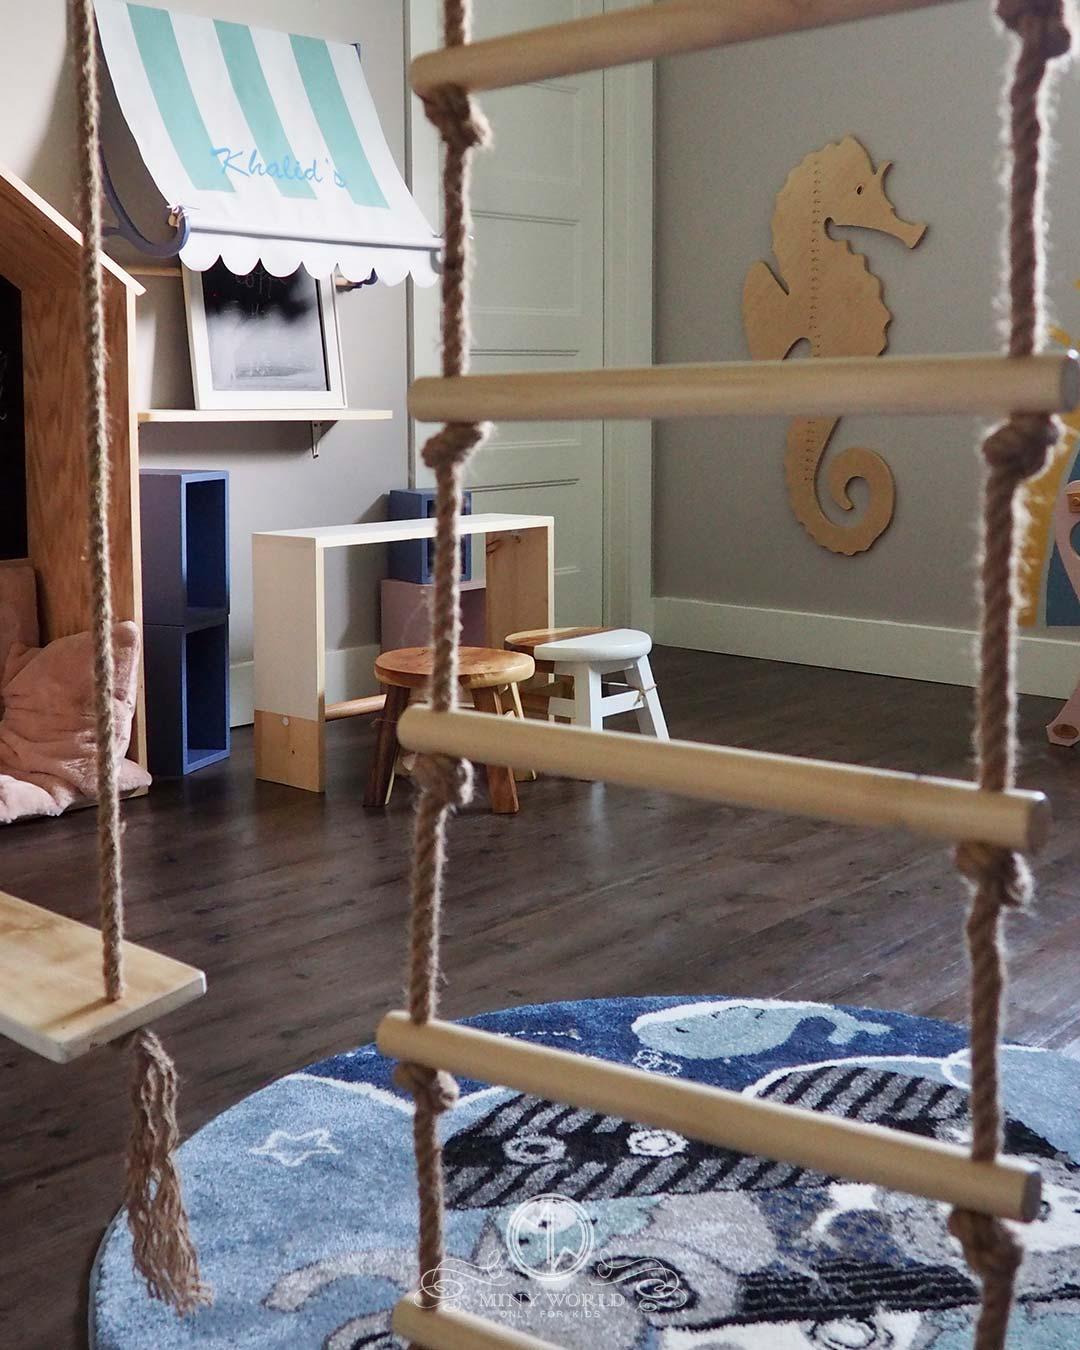 Noah_playroom_interior_design_minyworld_3